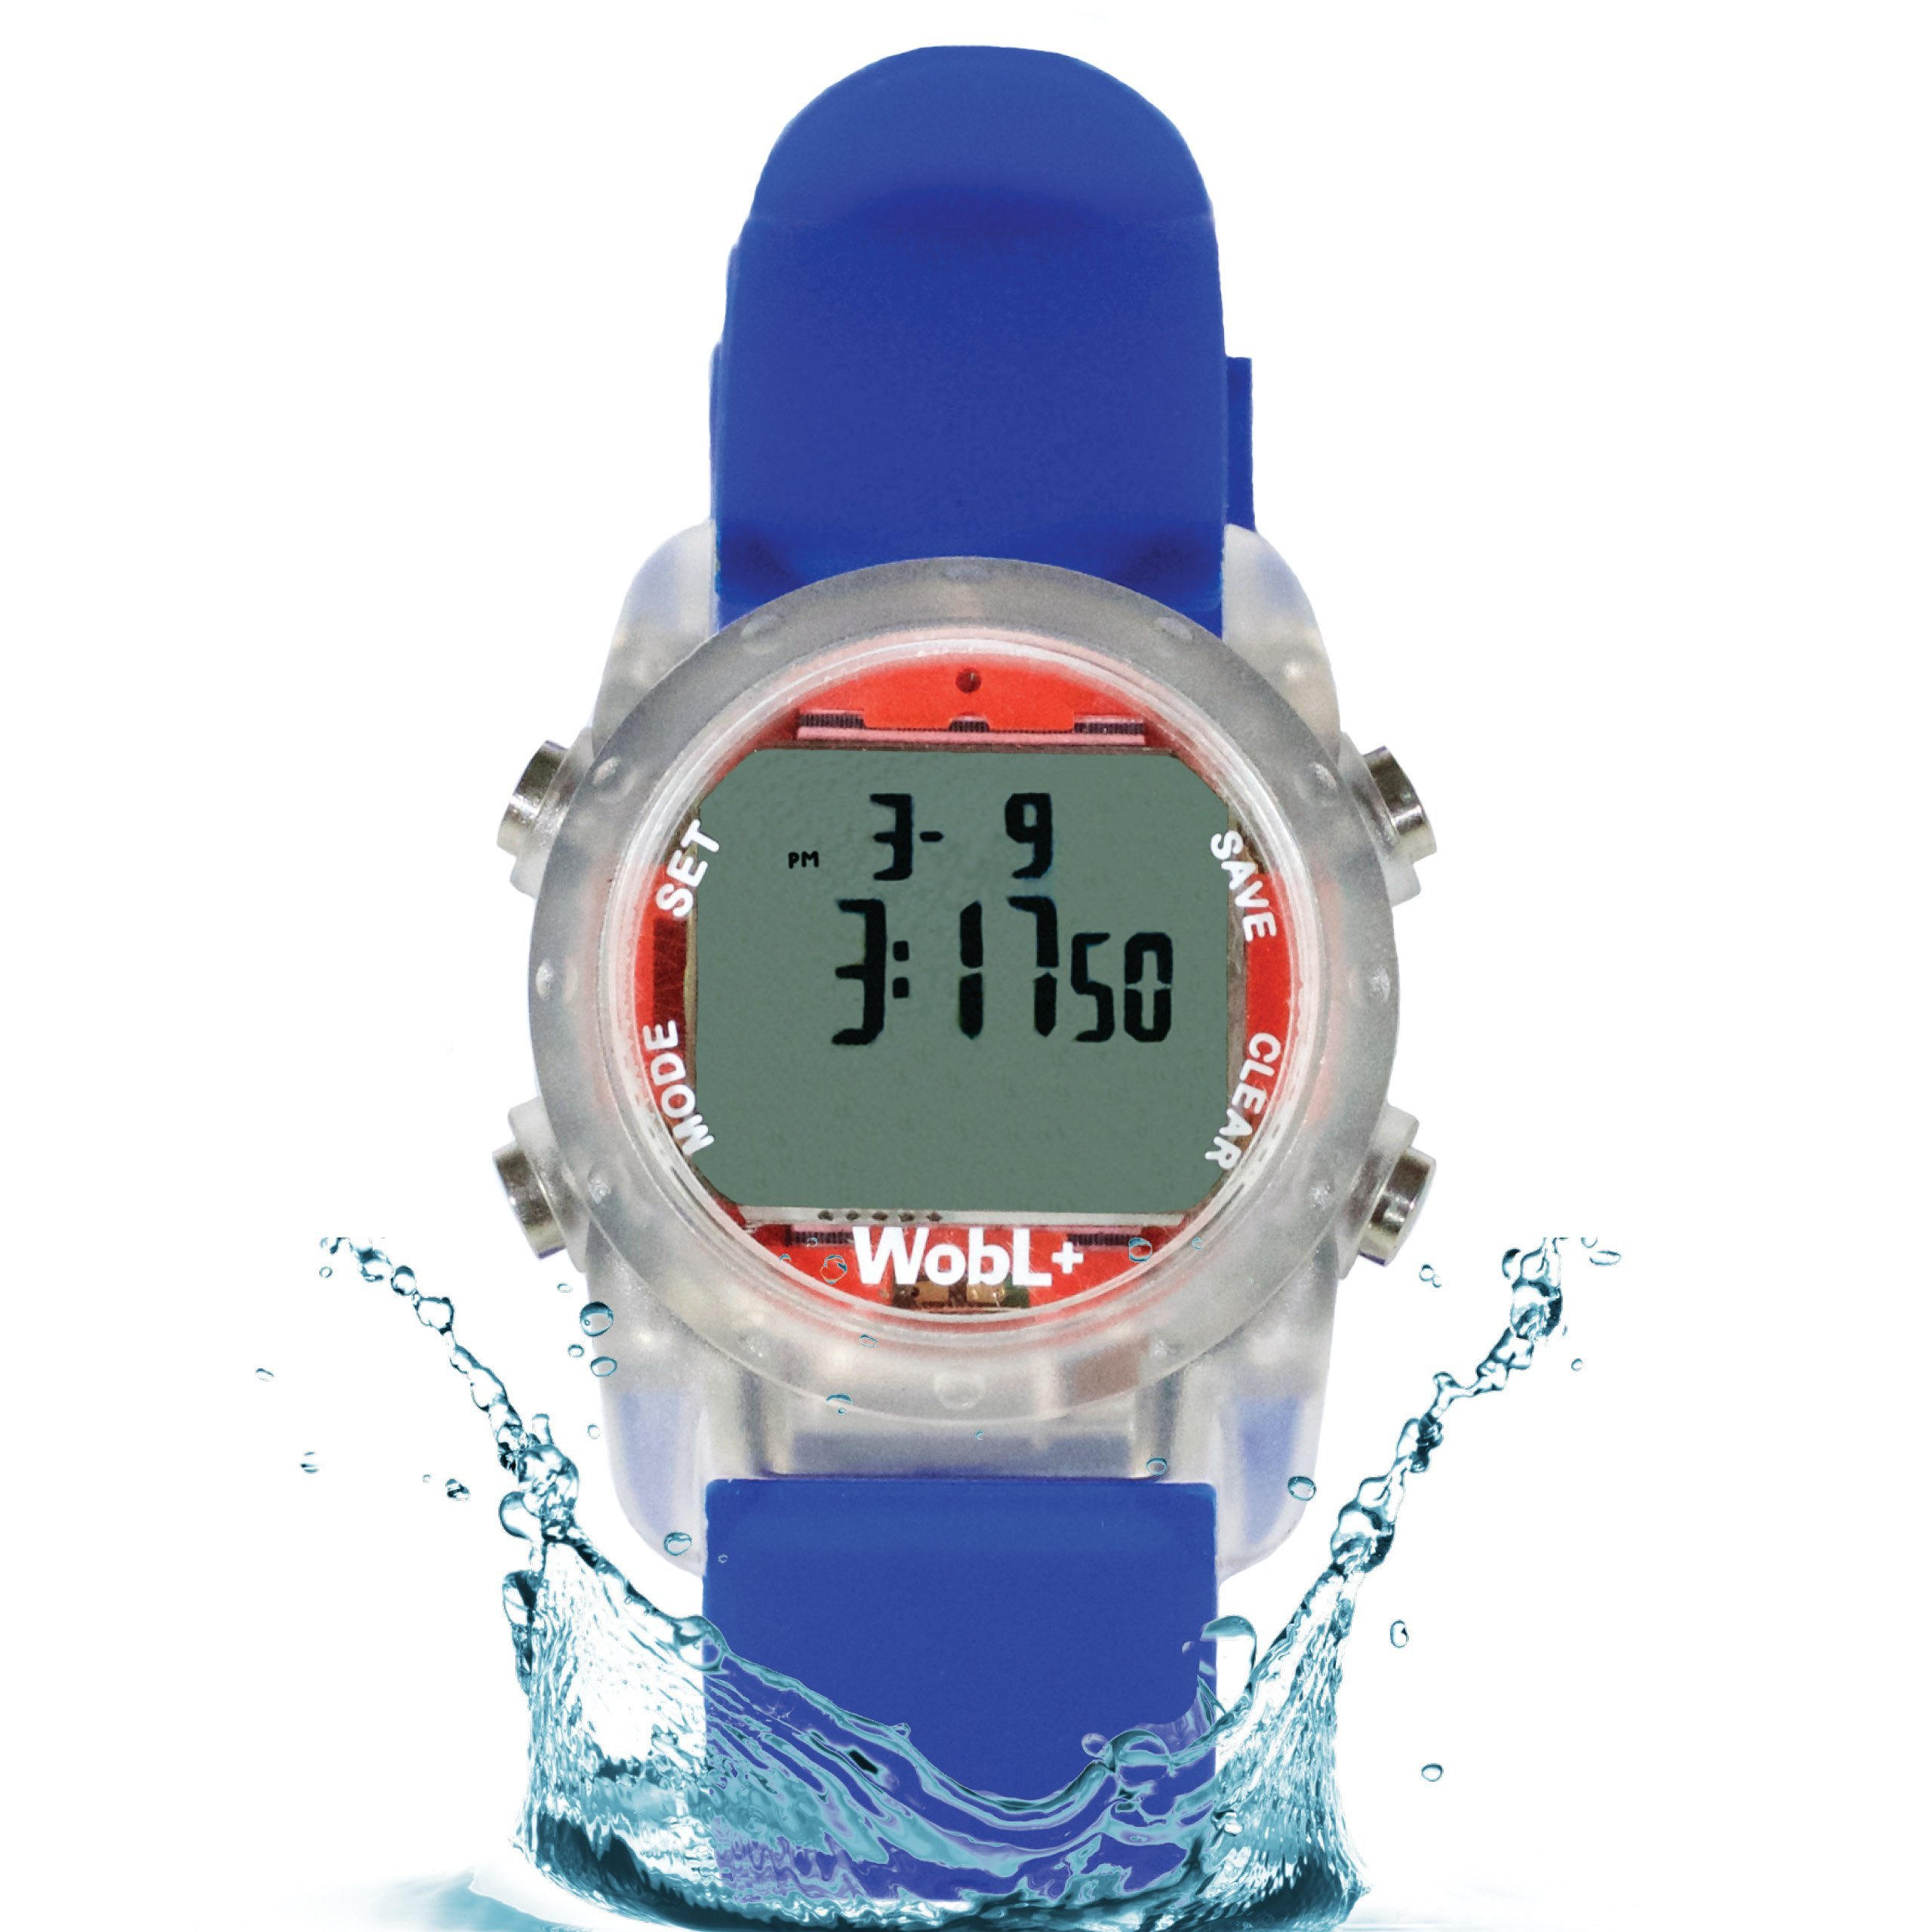 WobL+ Waterproof Vibrating Watch (Blue)